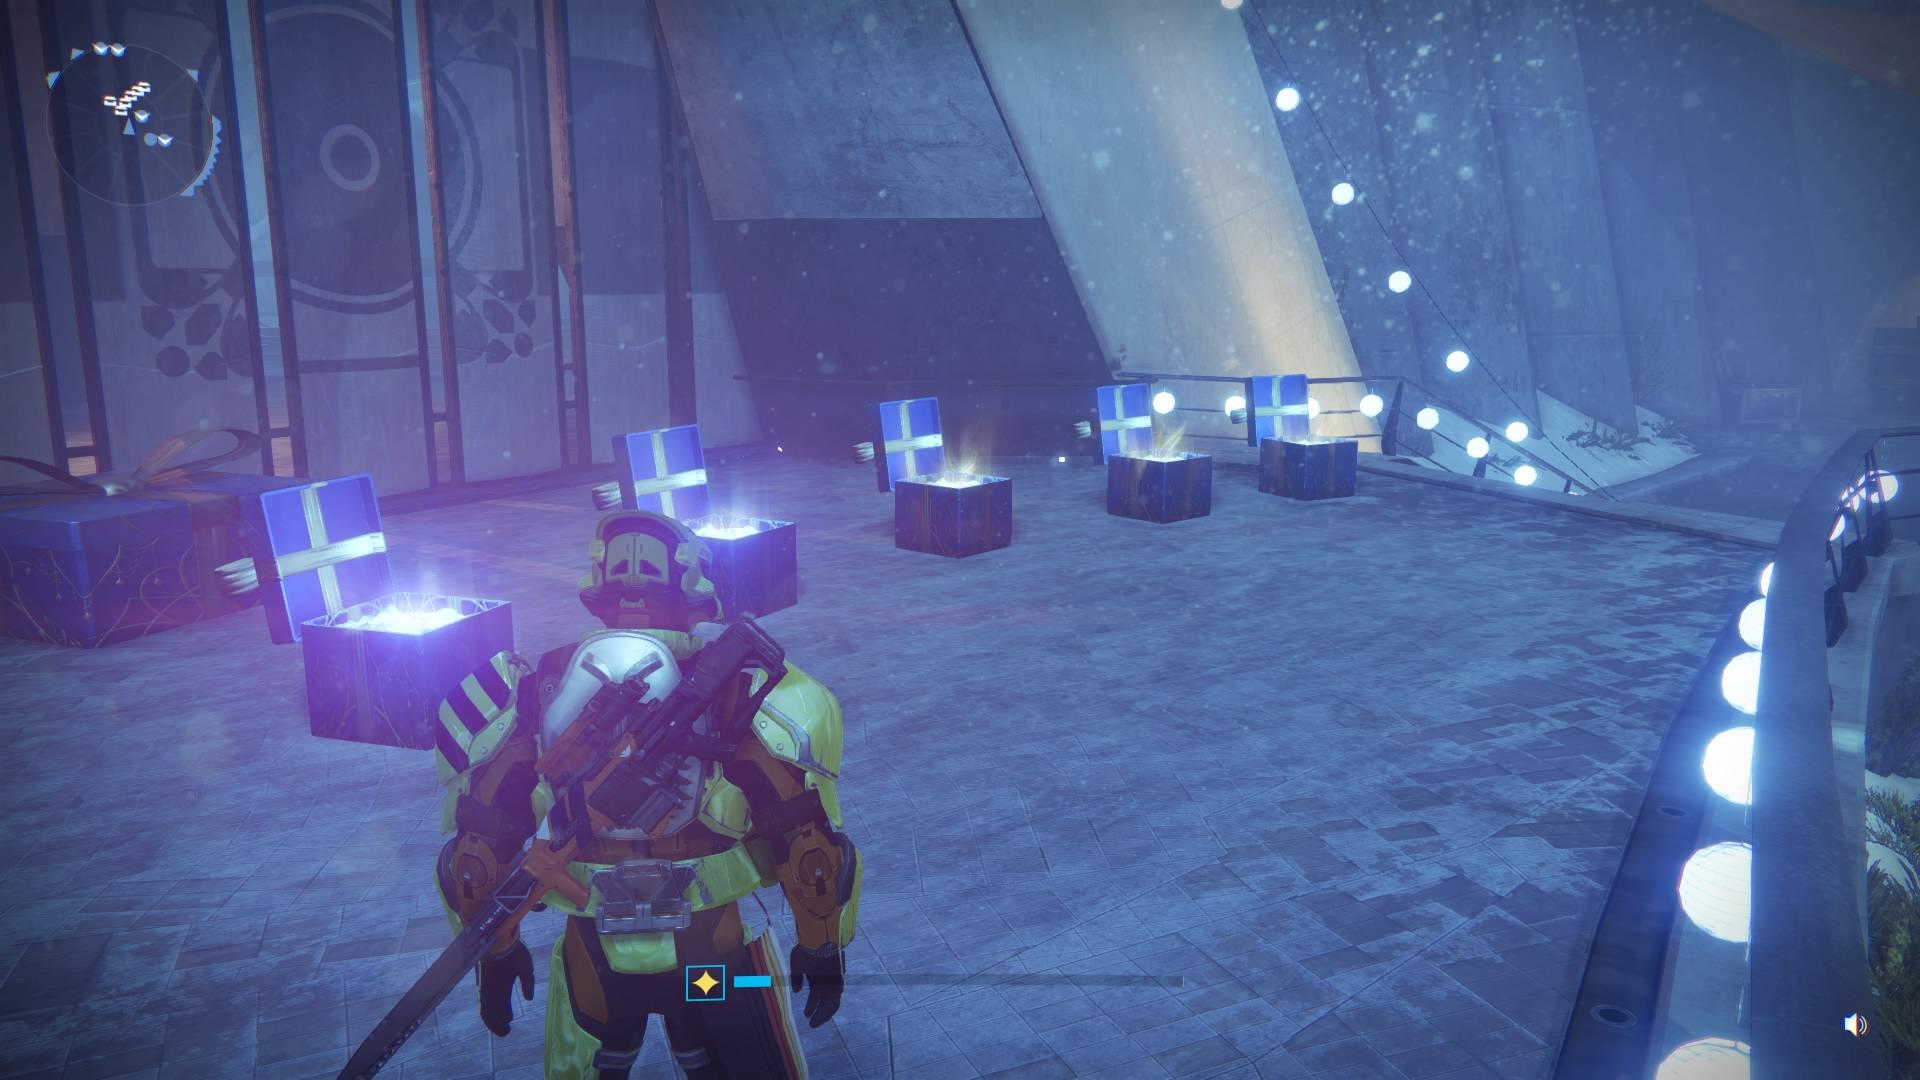 Destiny: Schicksalszettel – Spieler erhalten Botschaft